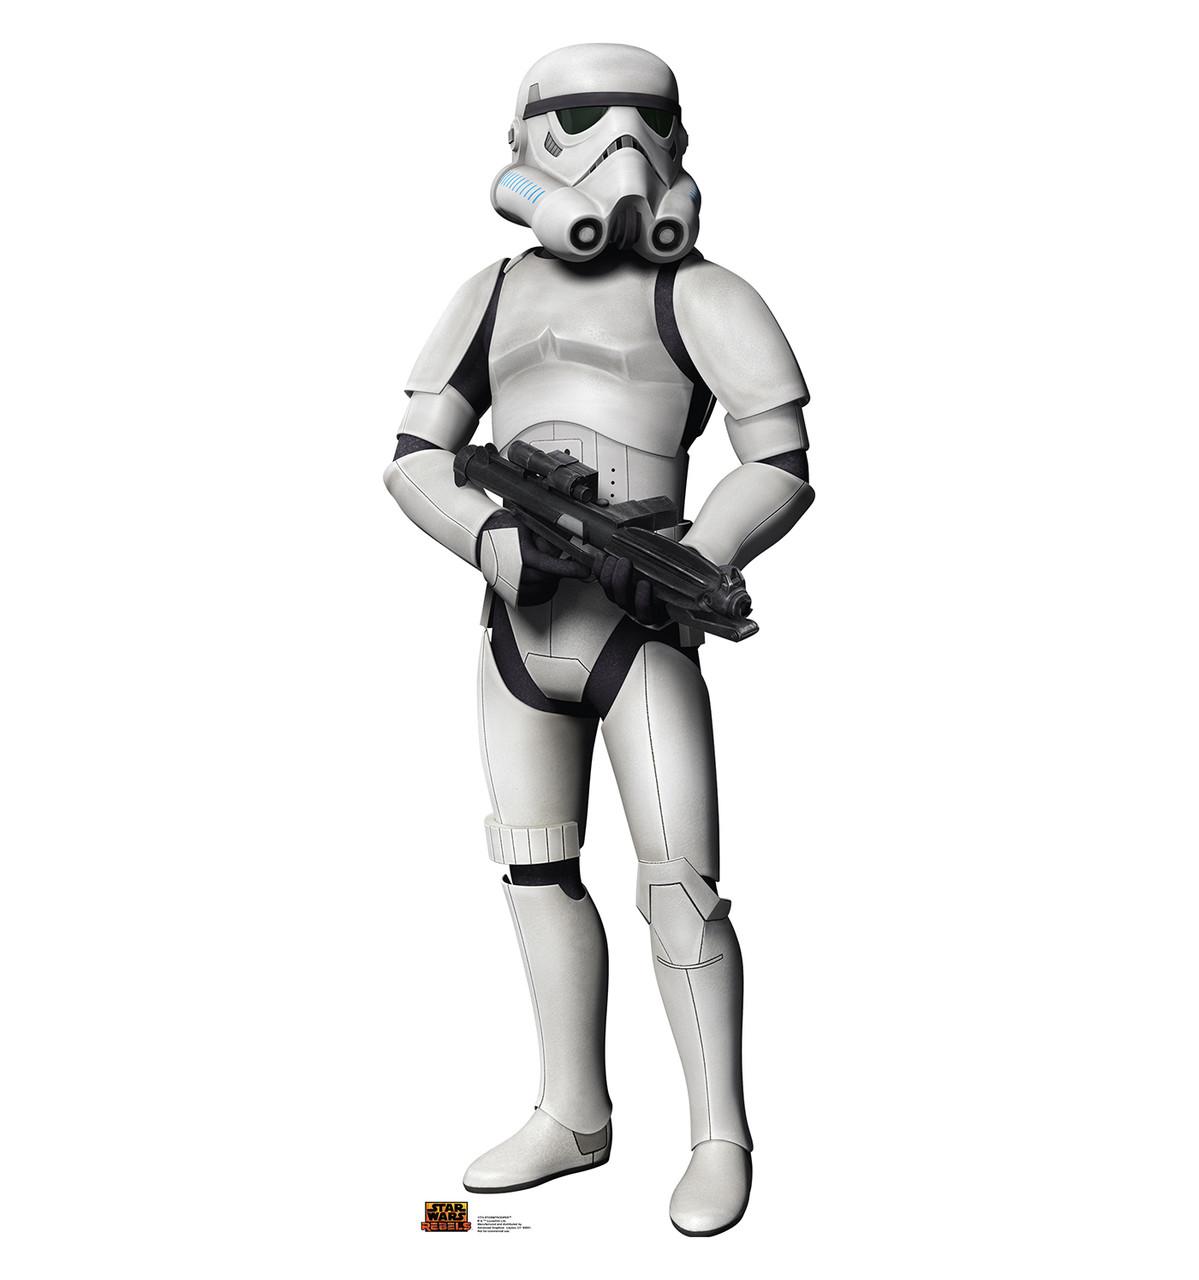 Life-size Stormtrooper - Star Wars Rebels Cardboard Standup | Cardboard Cutout